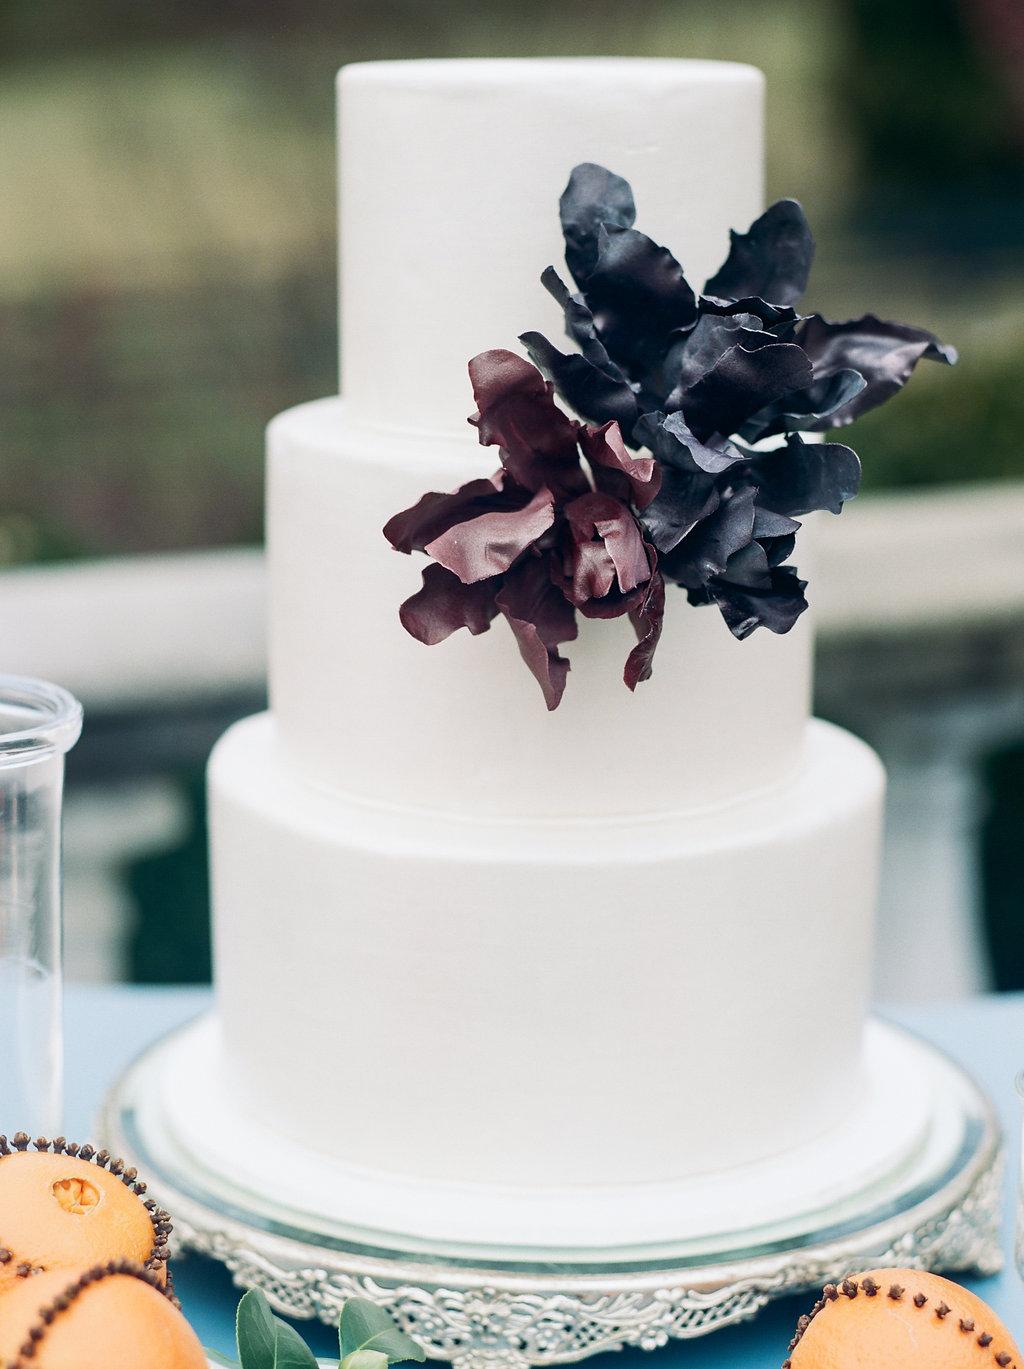 wedding cakes with sugar flowers - photo by Lissa Ryan Photography http://ruffledblog.com/modern-romantic-wedding-ideas-with-family-heirlooms